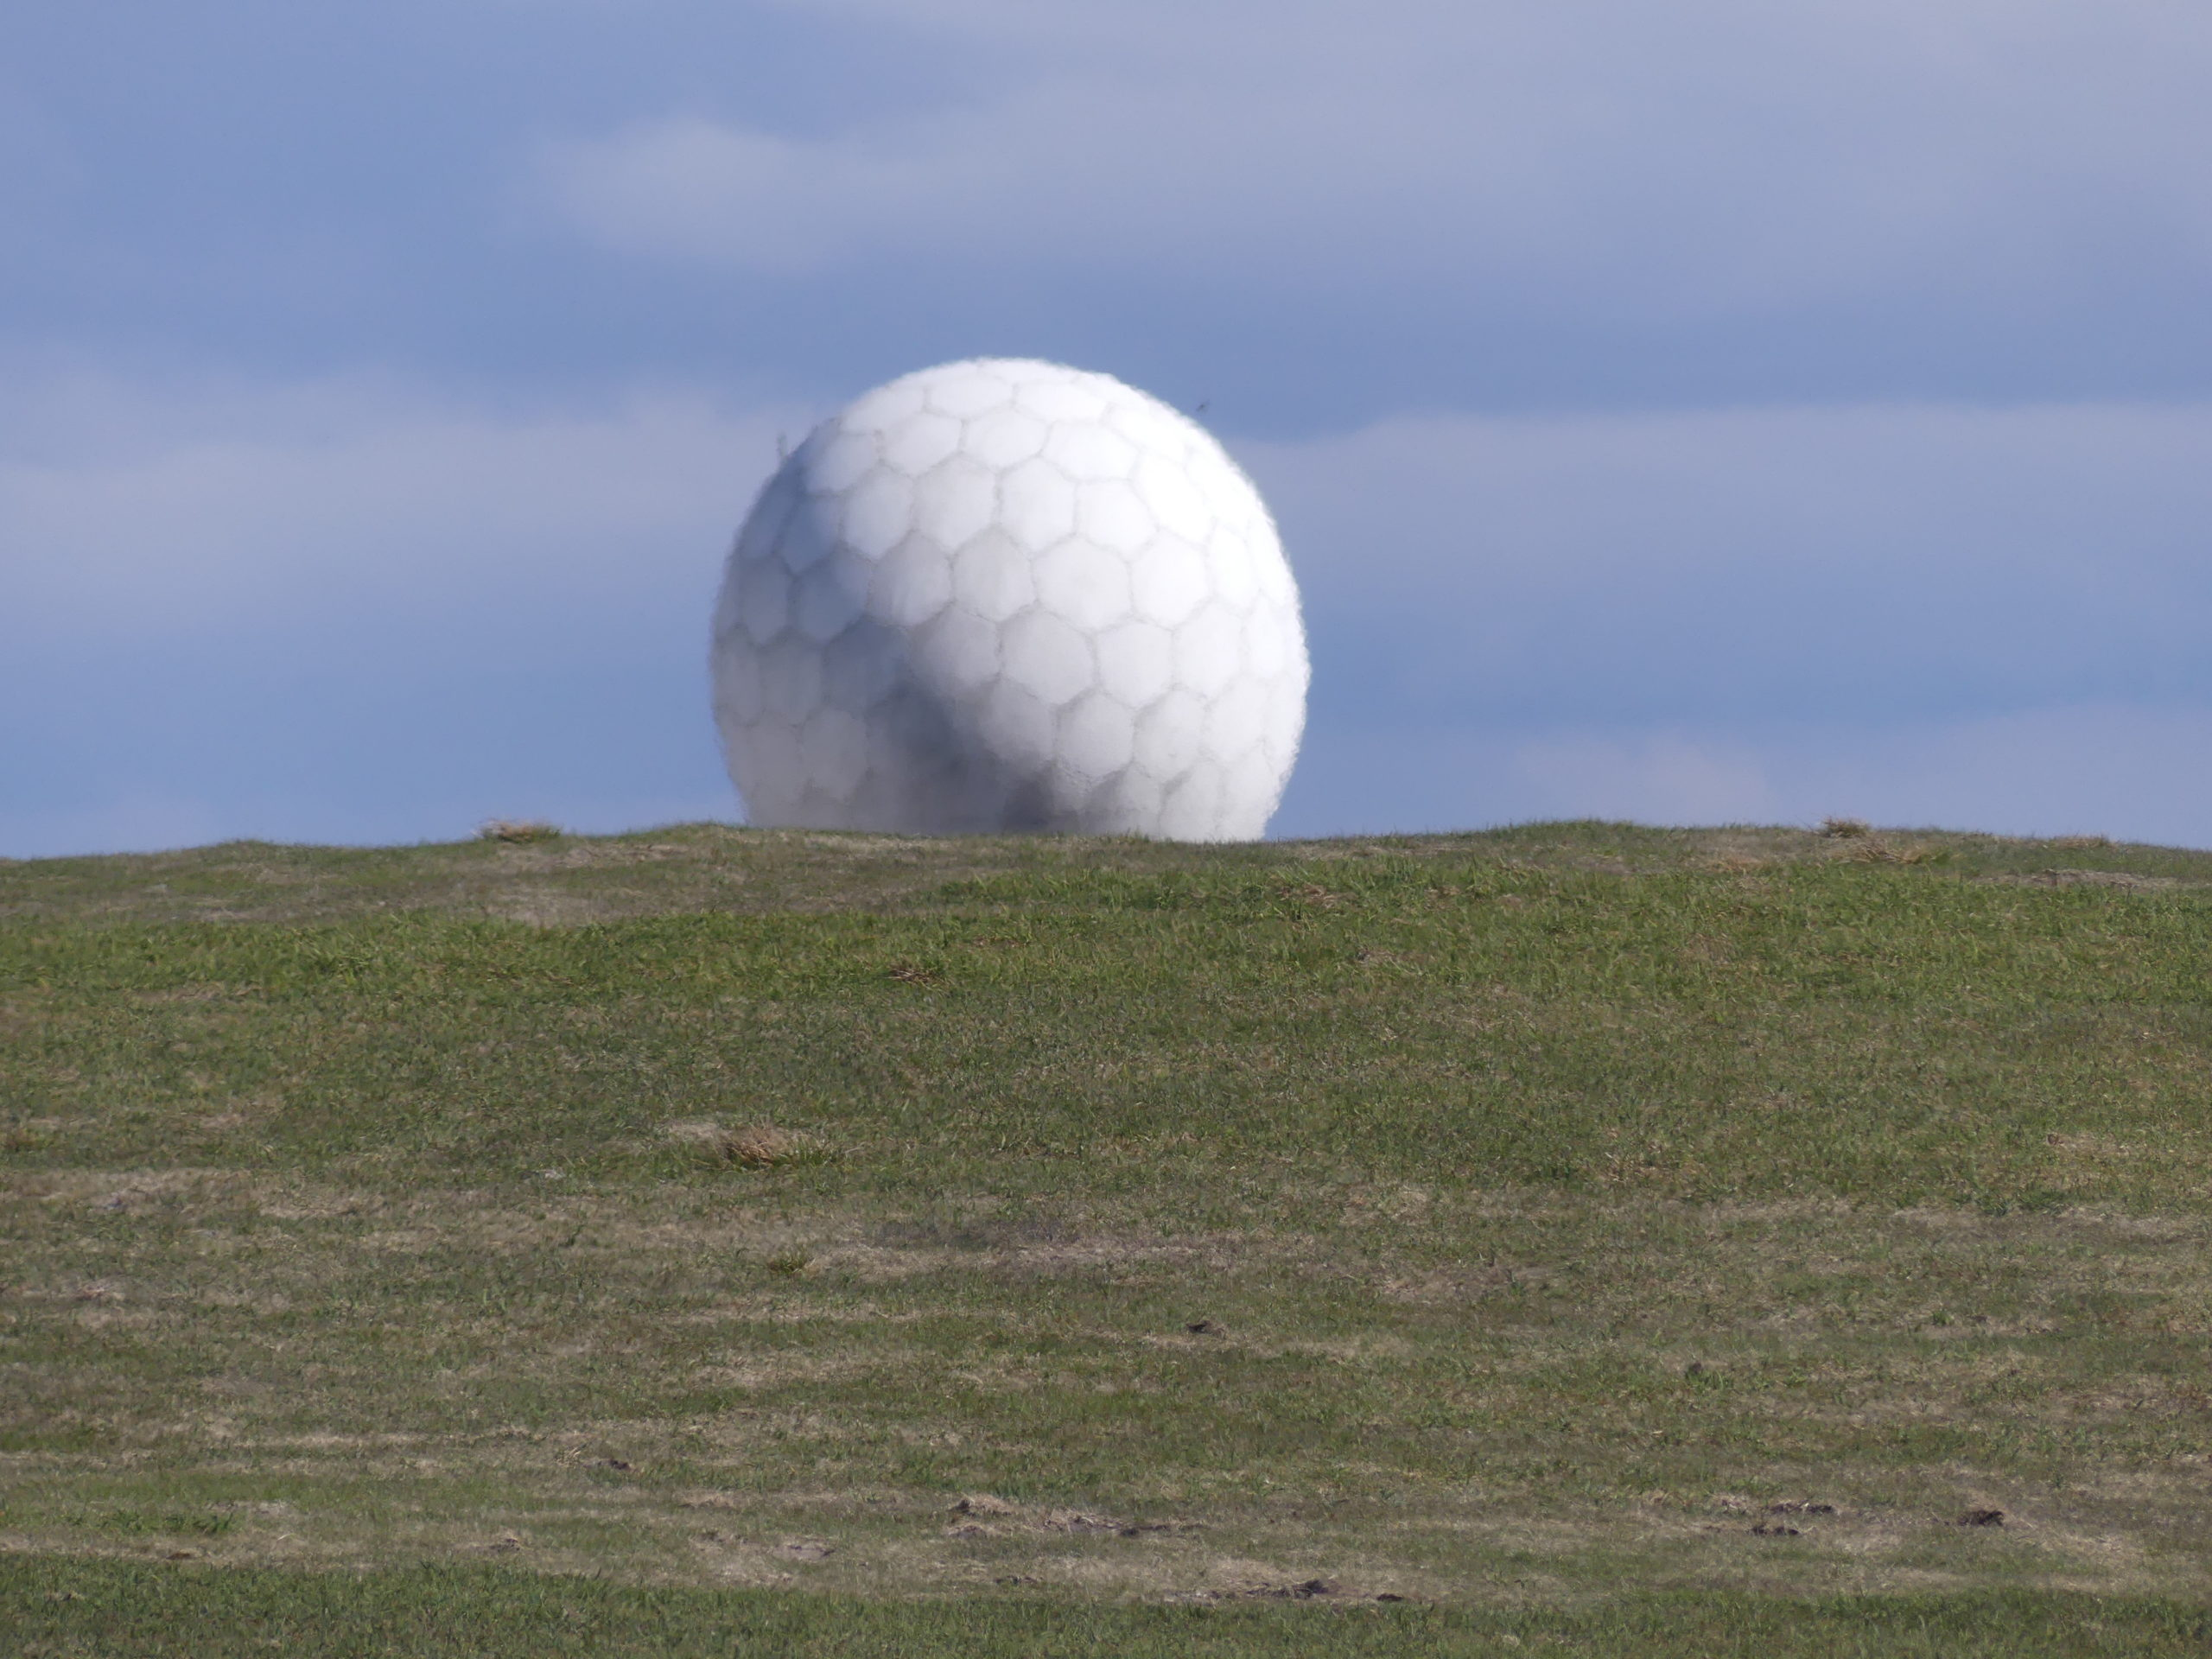 The Great Dun Fell golf ball radar staion